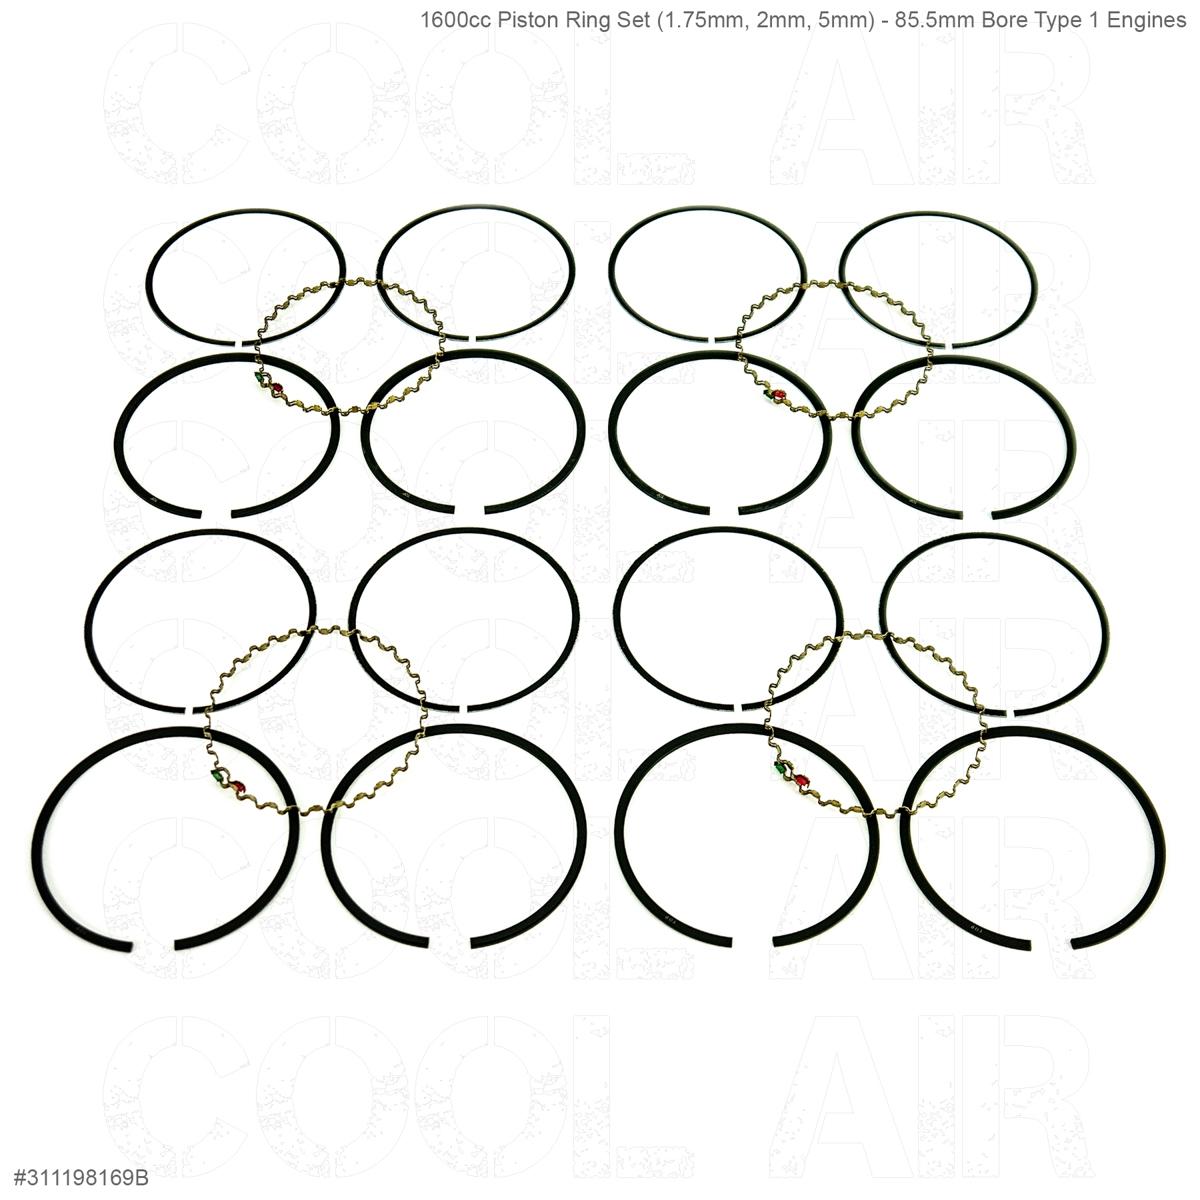 1600cc Piston Ring Set (1.75mm, 2mm, 5mm) - 85.5mm Bore Type 1 Engines